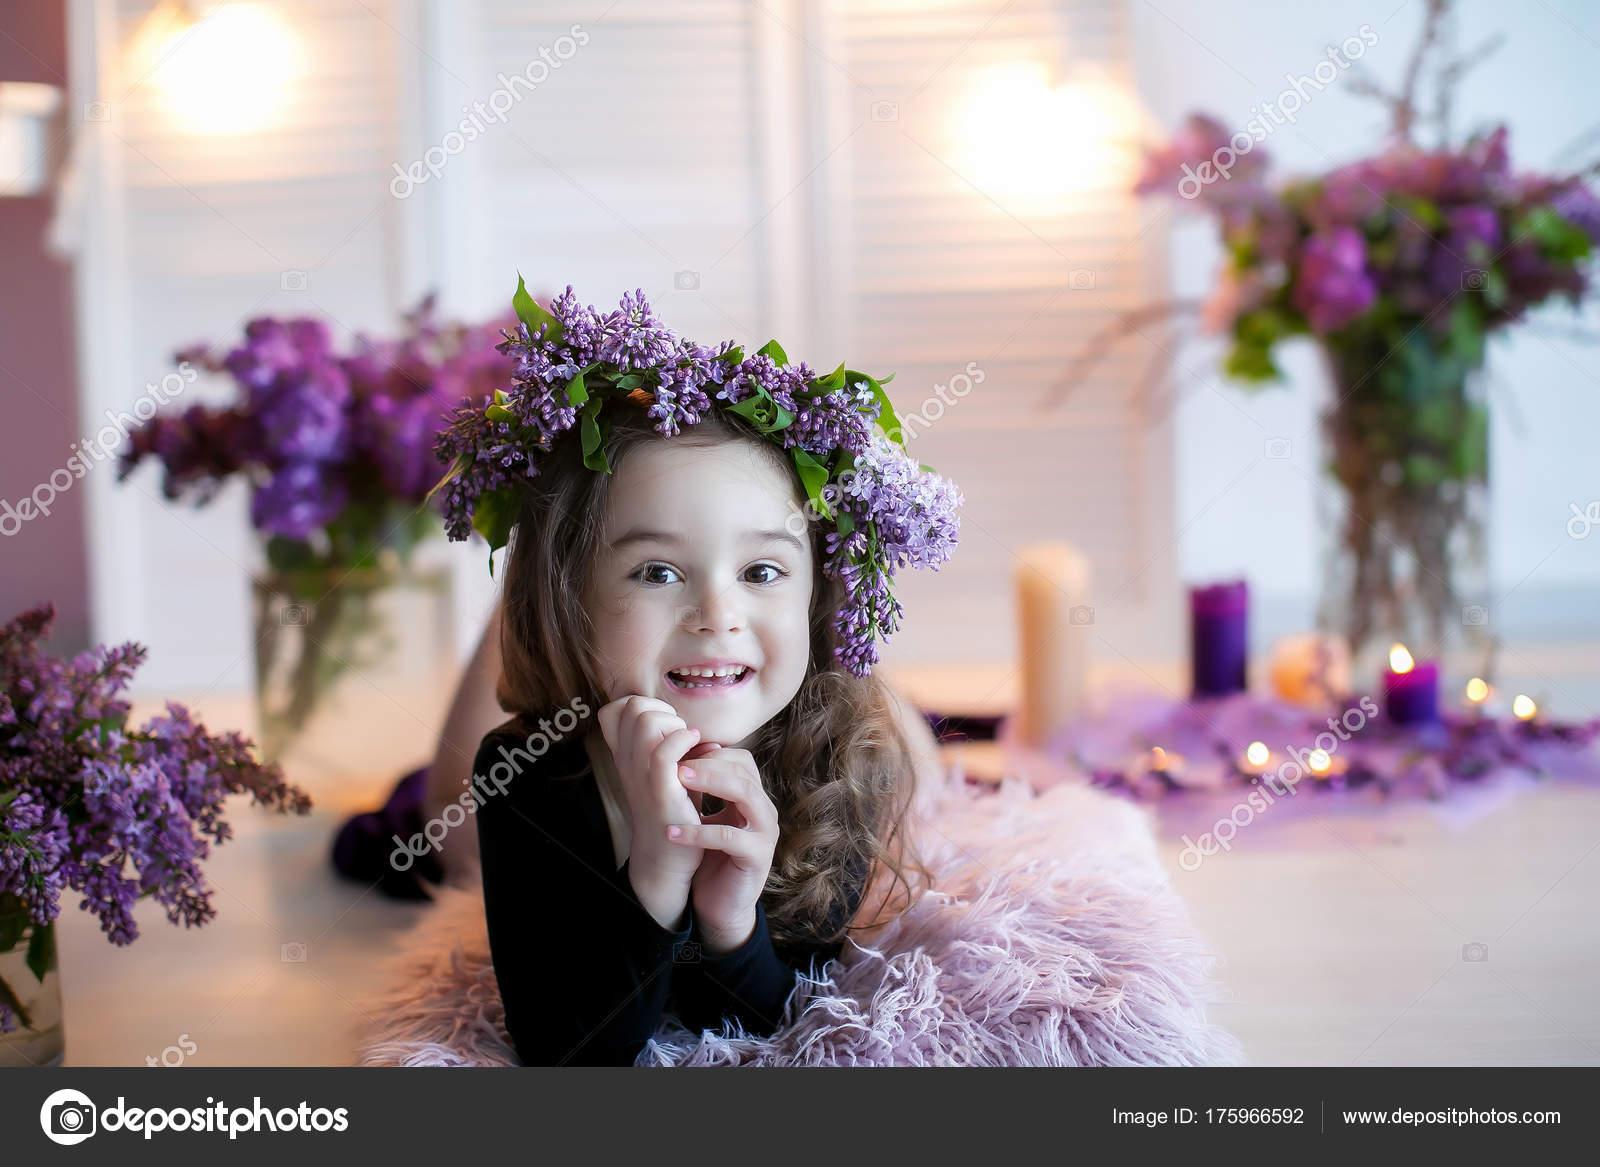 Little Smiling Girl Posing Lying Floor Purple Flowers Bouquets